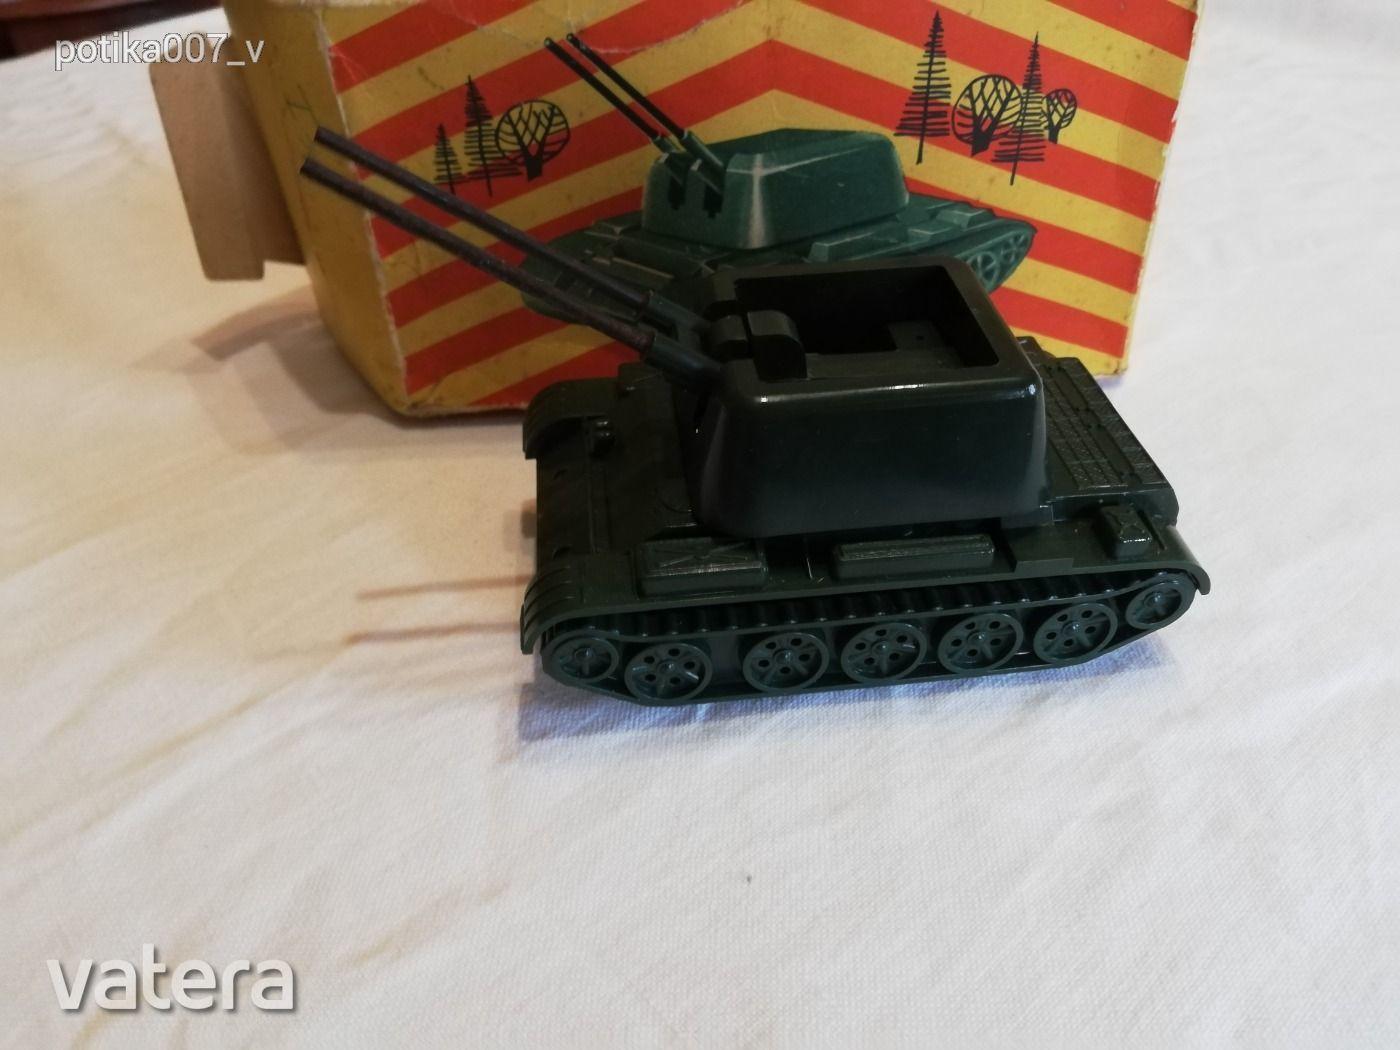 ddd-lemez-lendulet-tank-dobozaban-375b_1_big.jpg